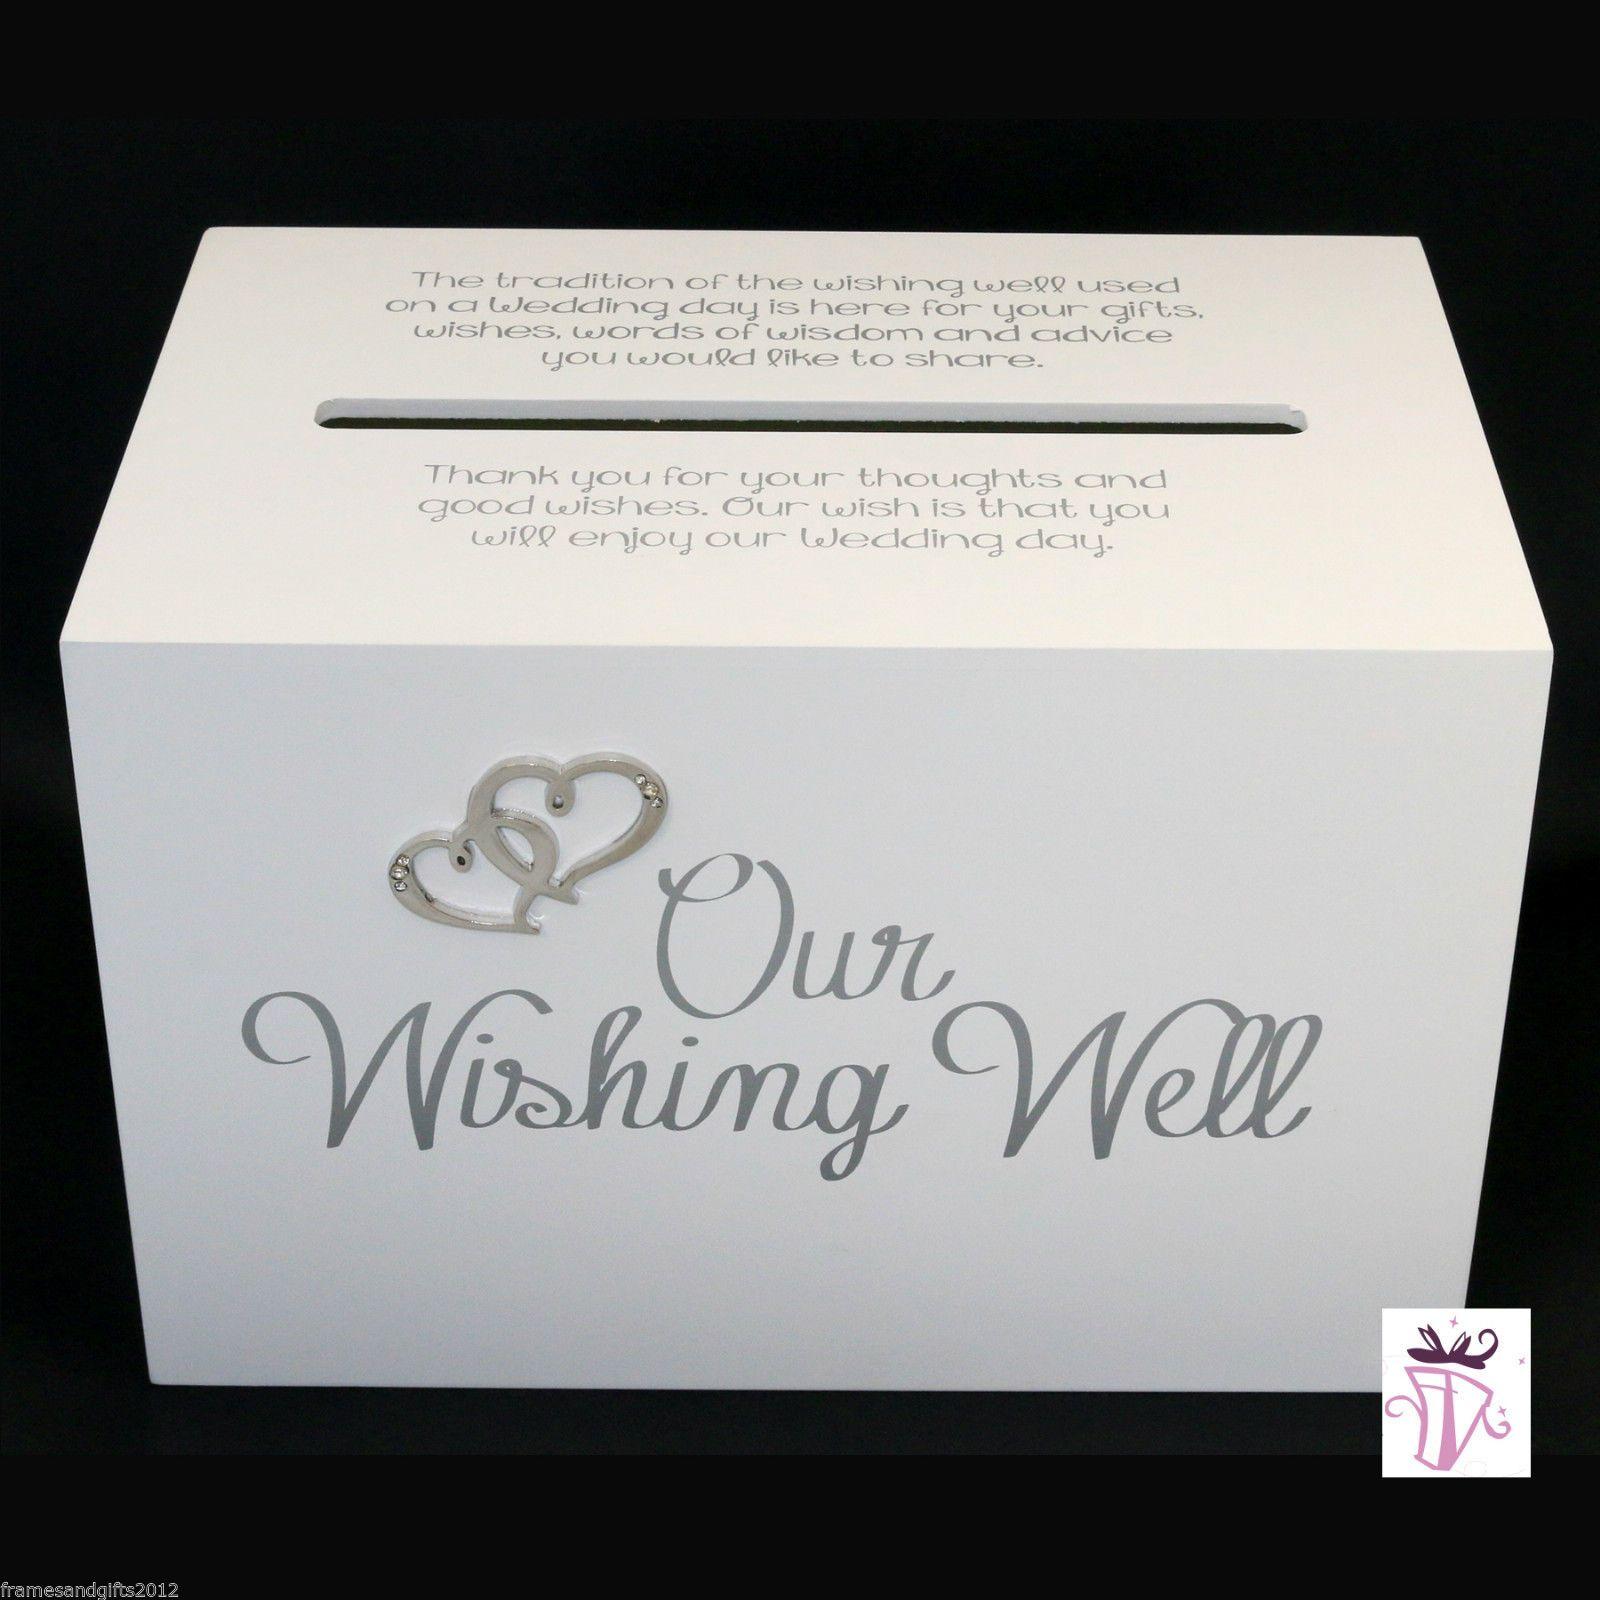 Wedding Wishing Well Gift Card White Box With Quote Our Wishing Well Wishing Well Wedding Wedding Gift Card Box Card Box Wedding